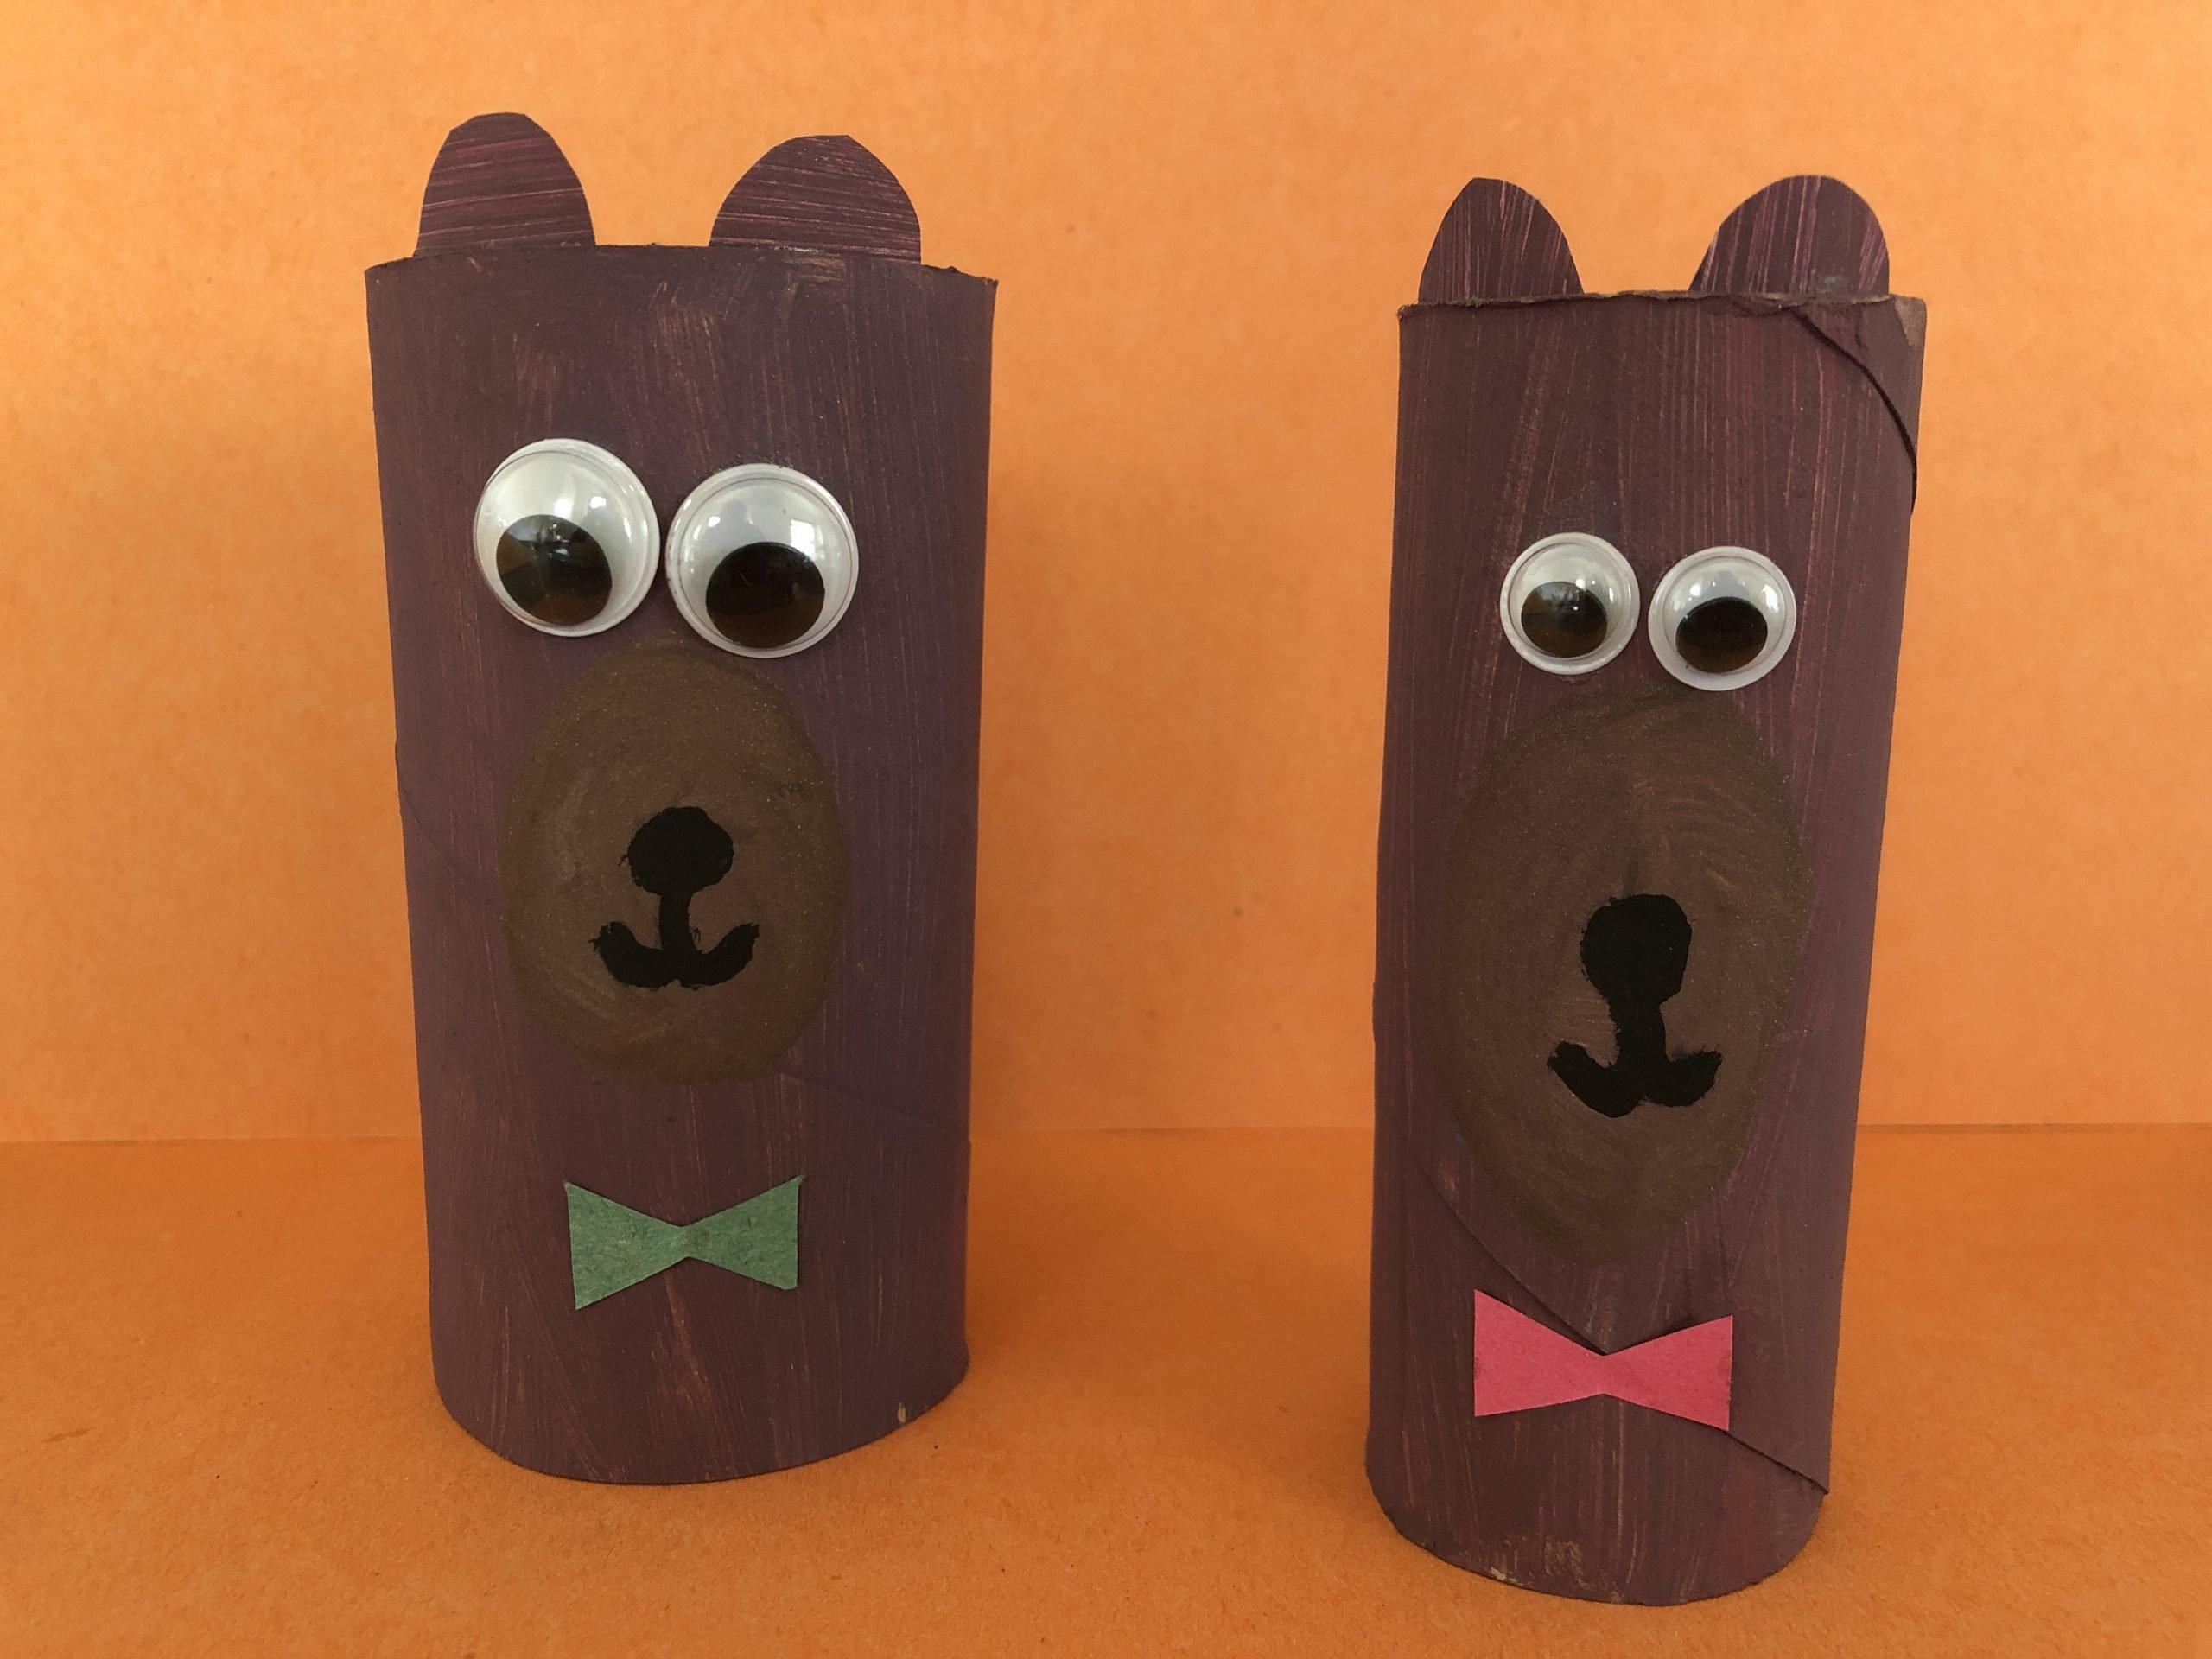 Cardboard Tube Bears